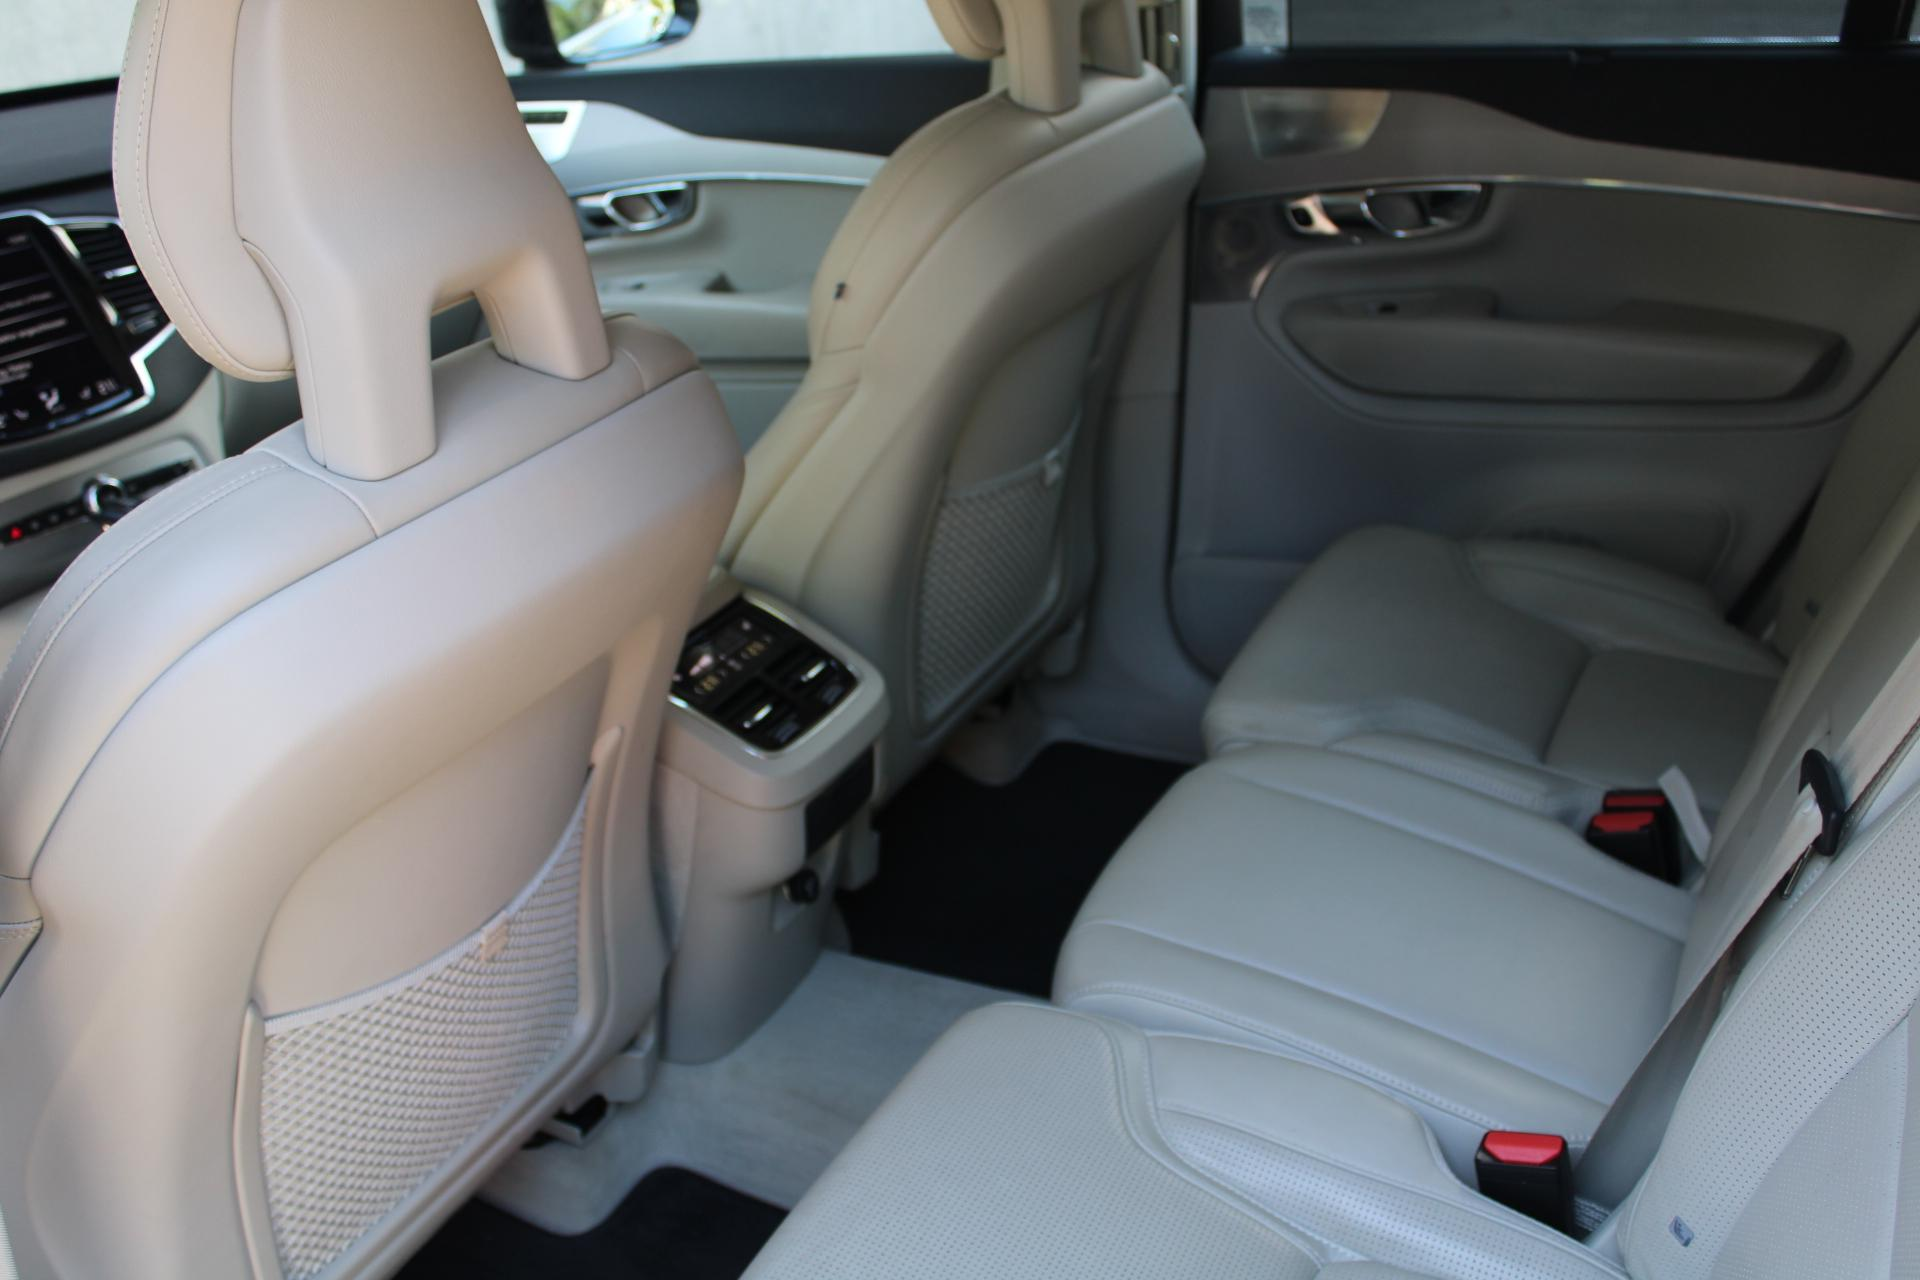 Volvo XC90 T6 AWD Inscription - Baldegger Automobile AG